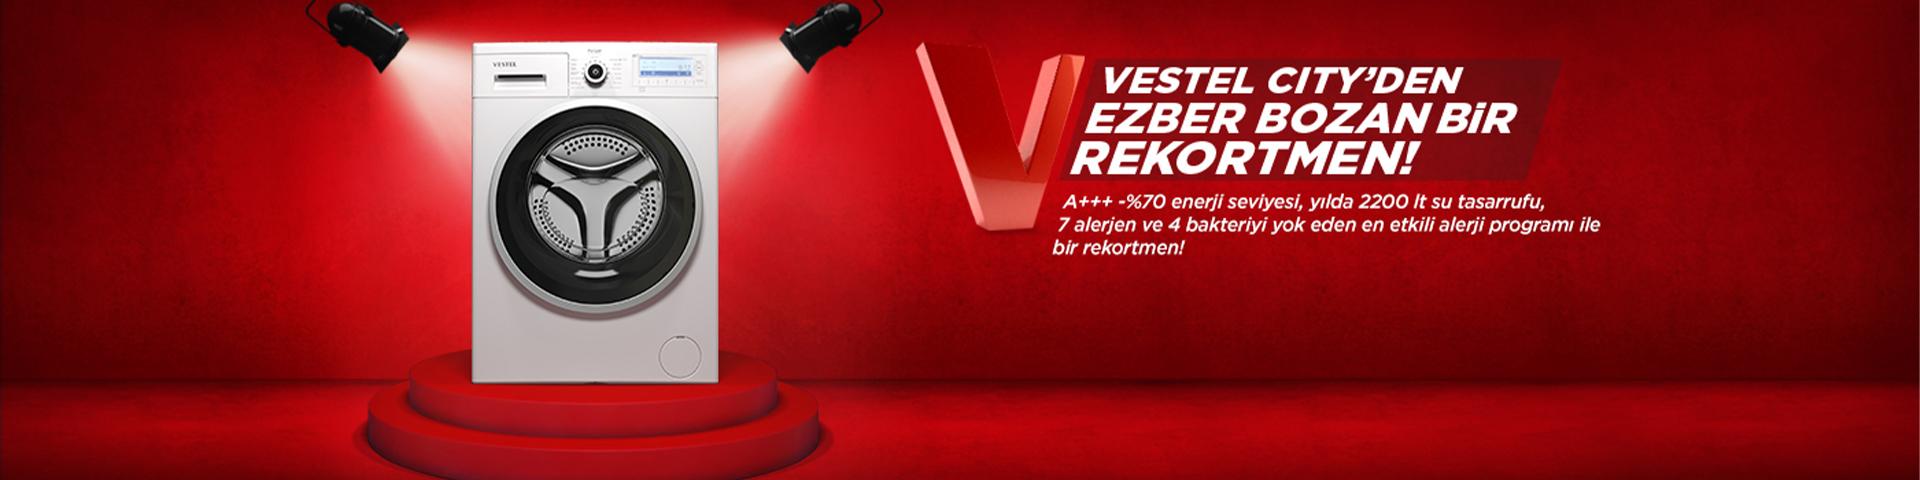 Vestel City'den Ezber Bozan Bir Rekortmen!